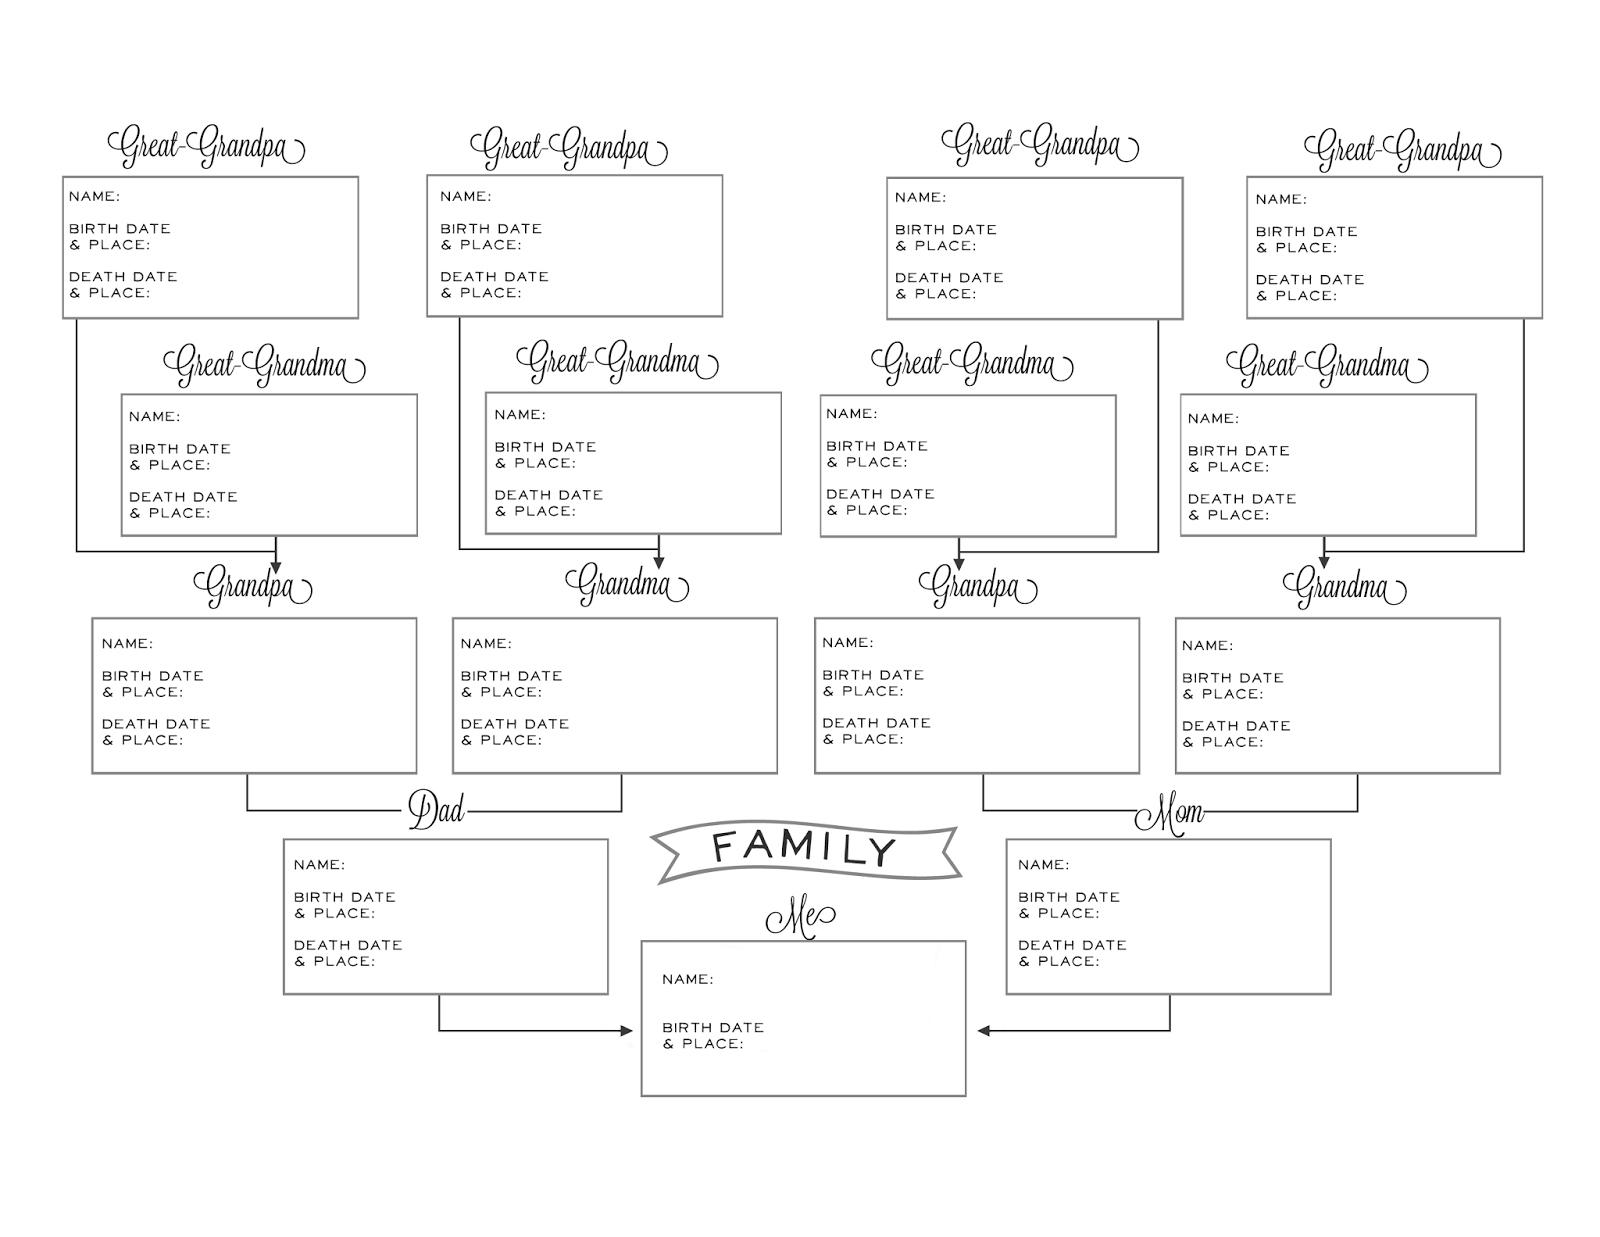 Printable Pedigree Chart | Ellipsis - Free Printable Genealogy Worksheets